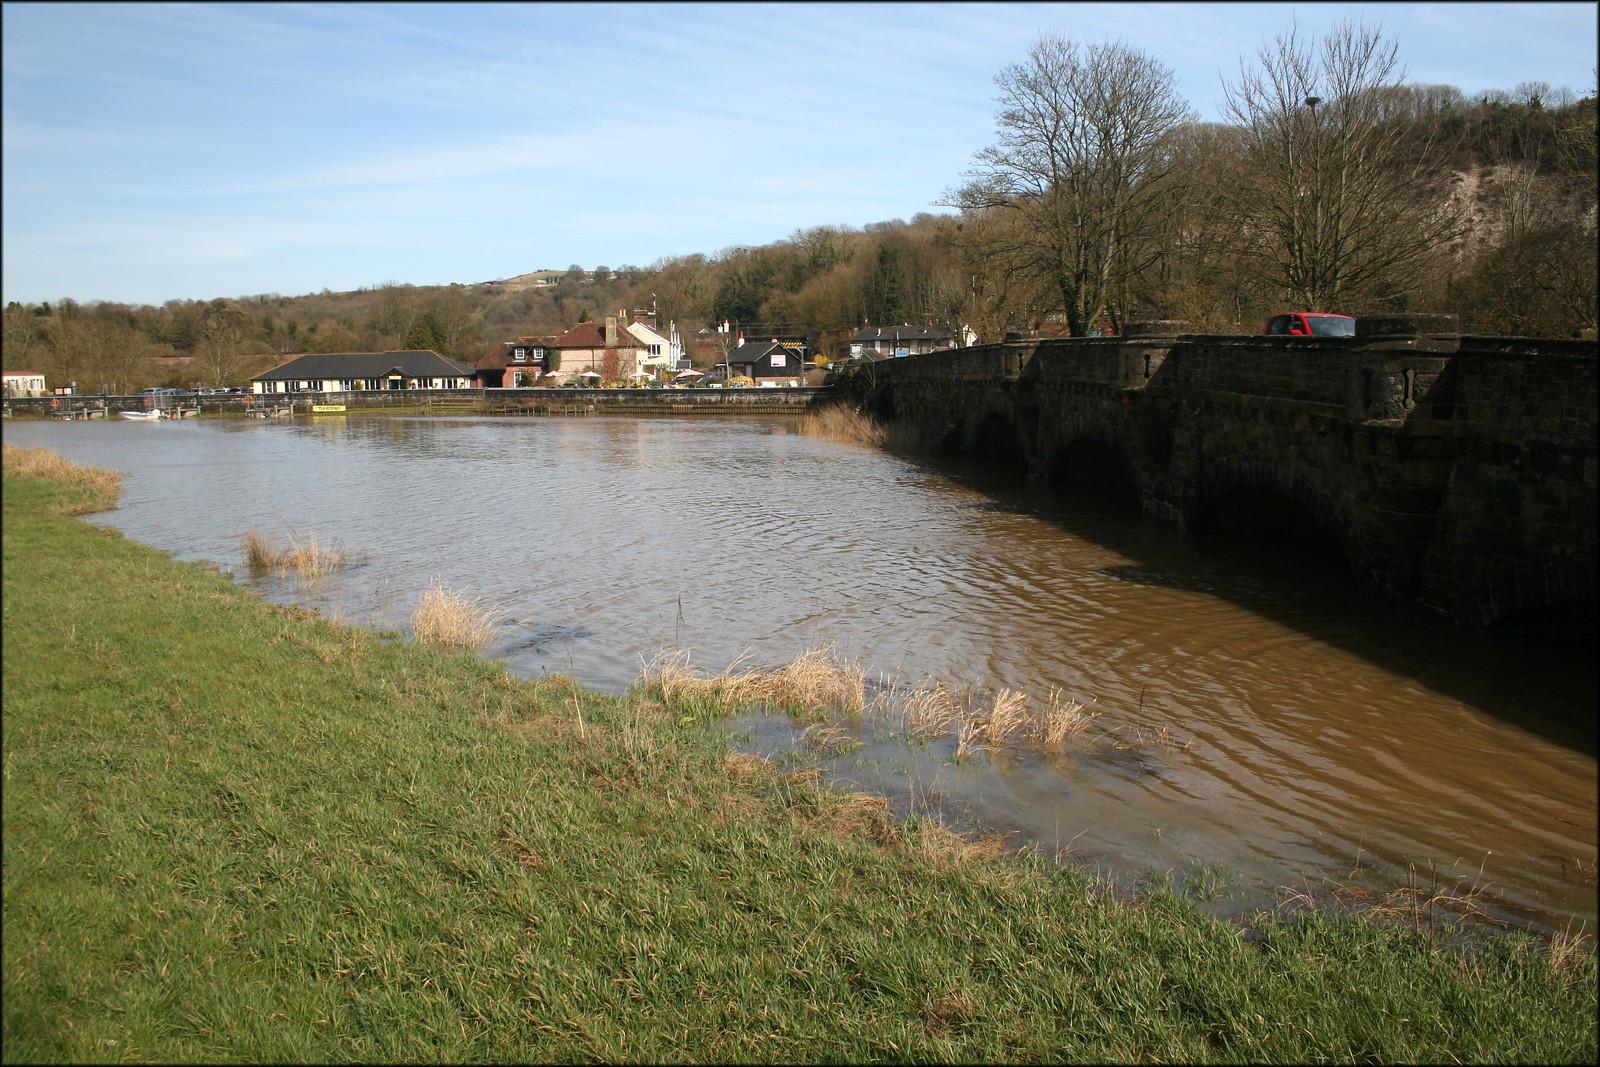 The River Arun at Amberley Station